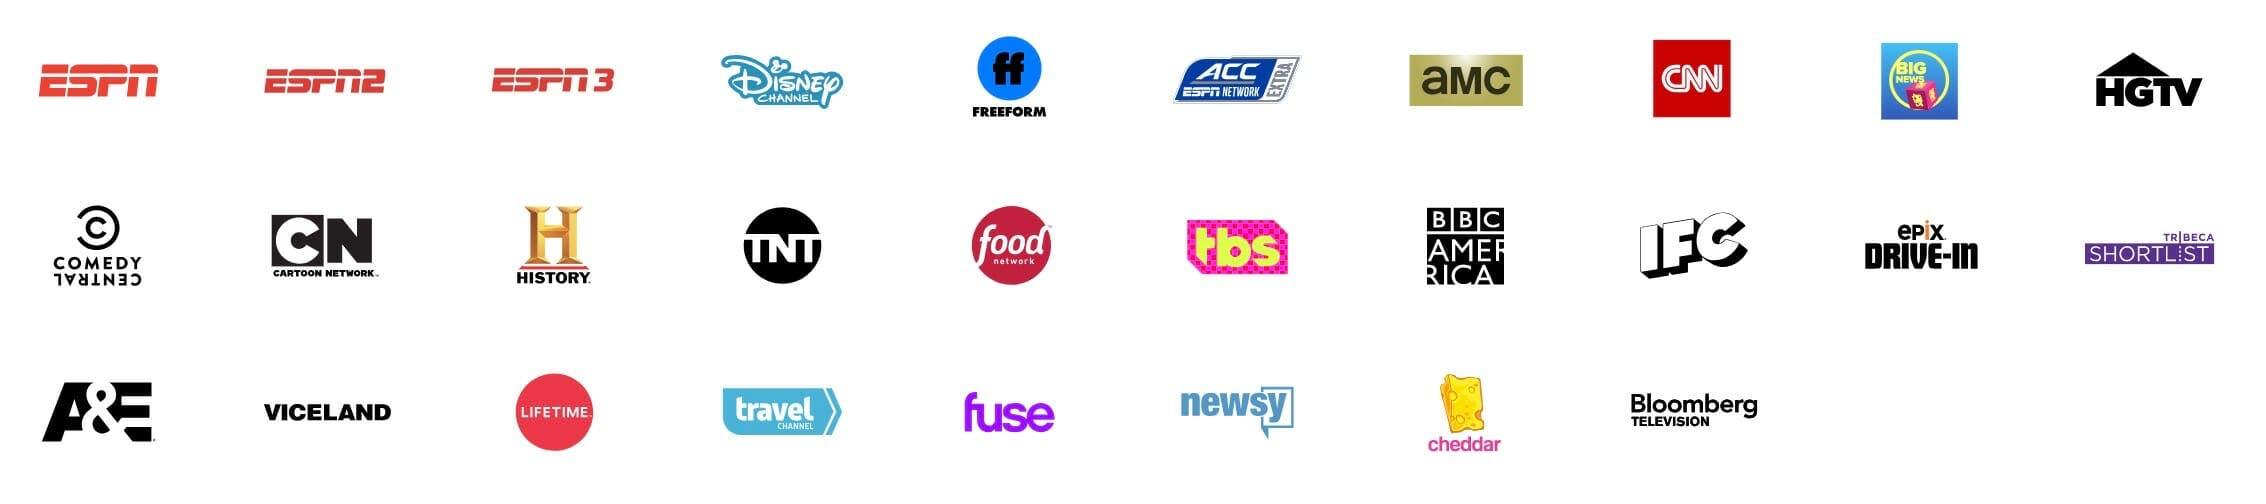 watch mnf on sling tv - sling orange channels